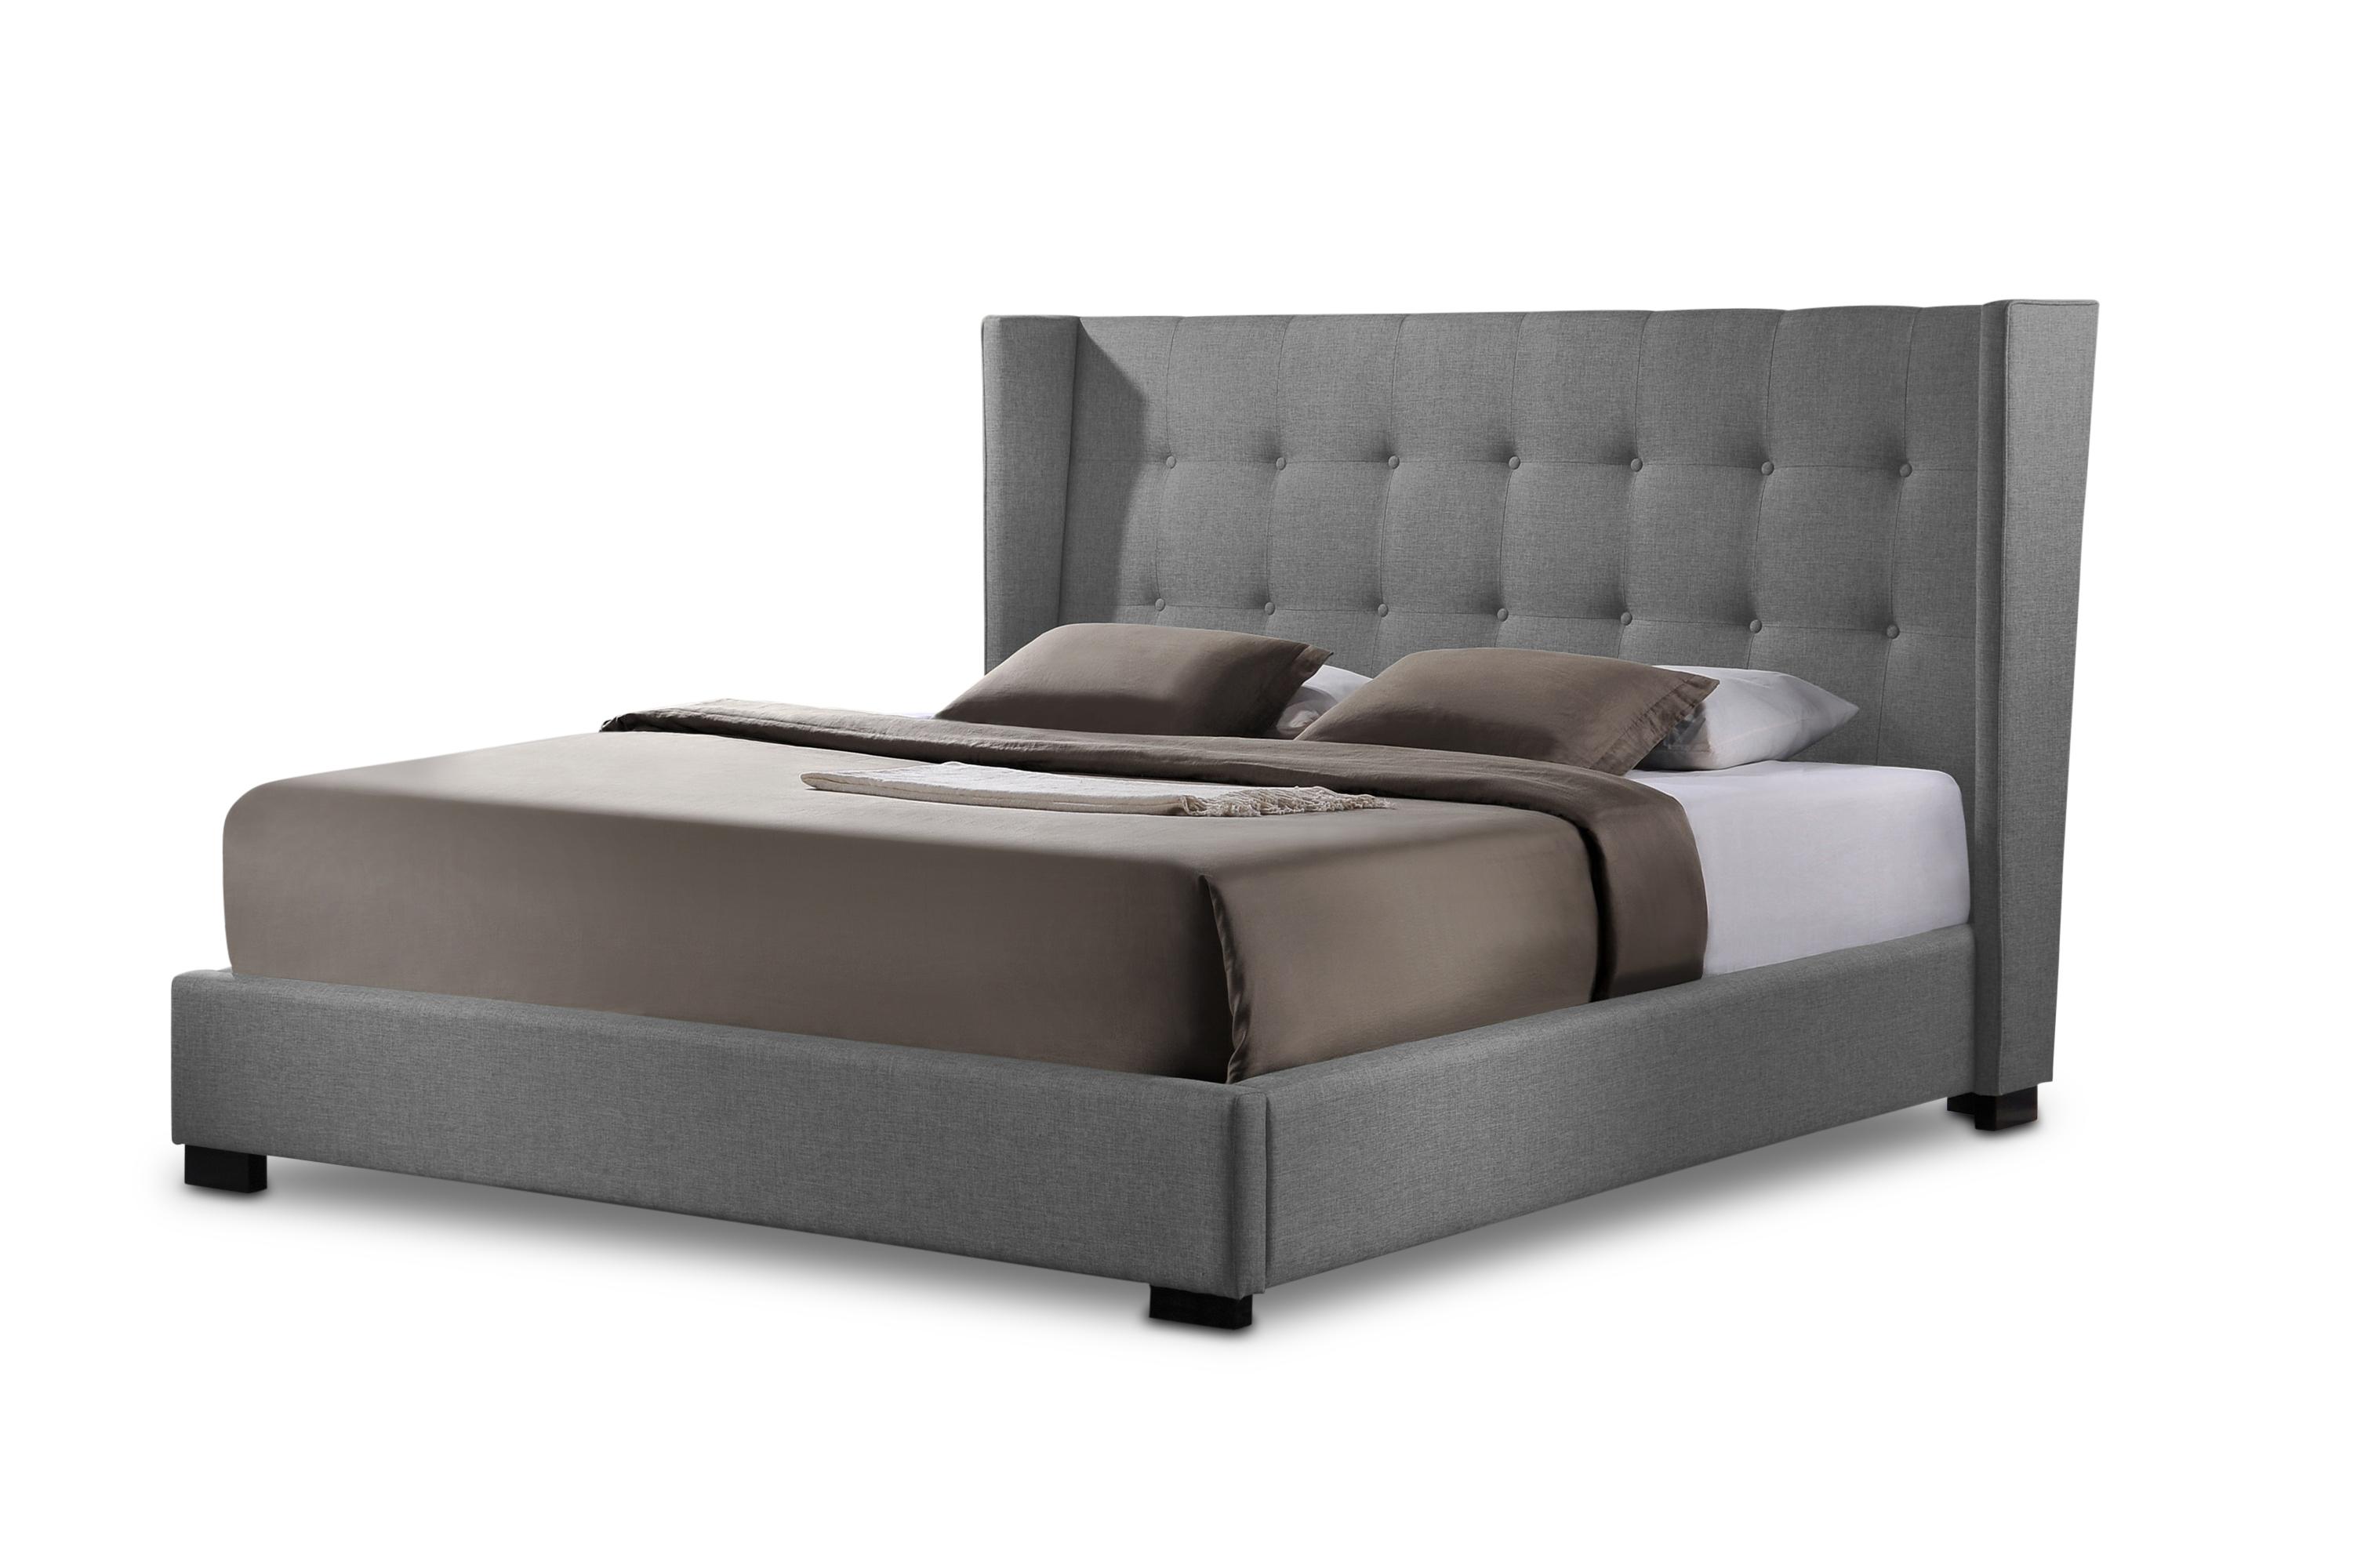 favela gray linen modern bed with upholstered headboard king size affordable modern design baxton studio - Upholstered Headboard King